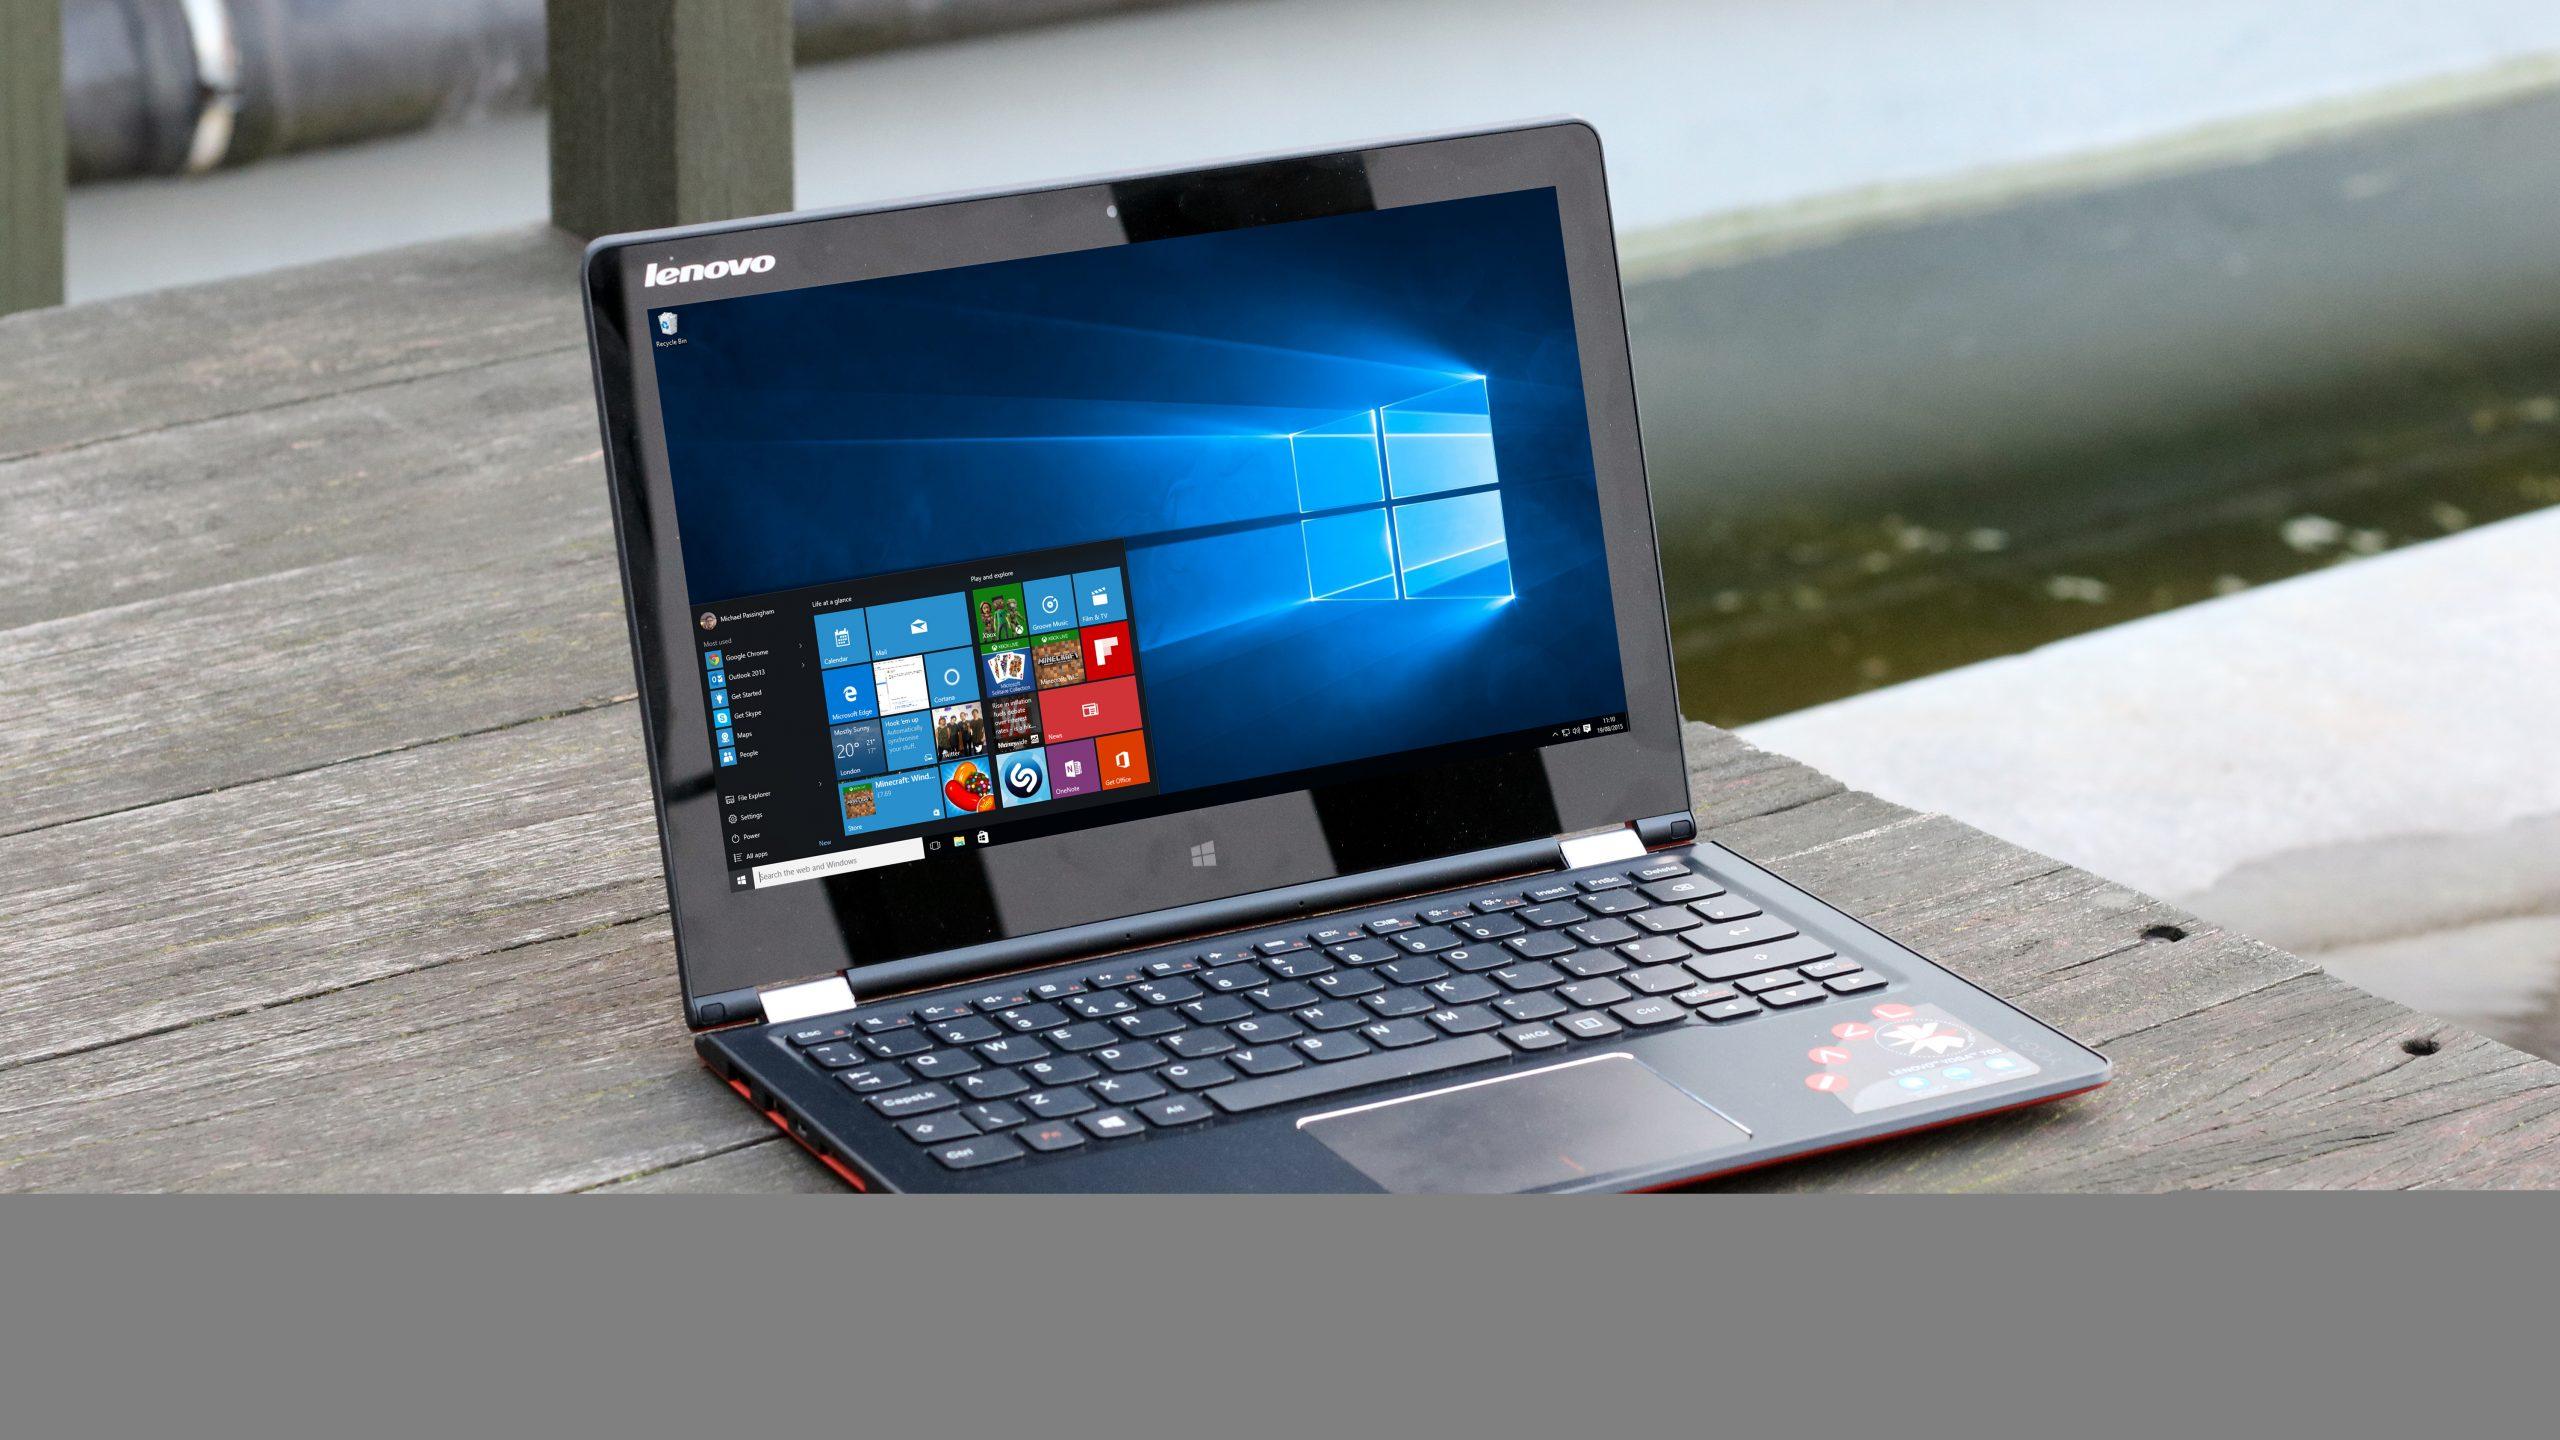 Lenovo Yoga 700 (11.6in) revisão